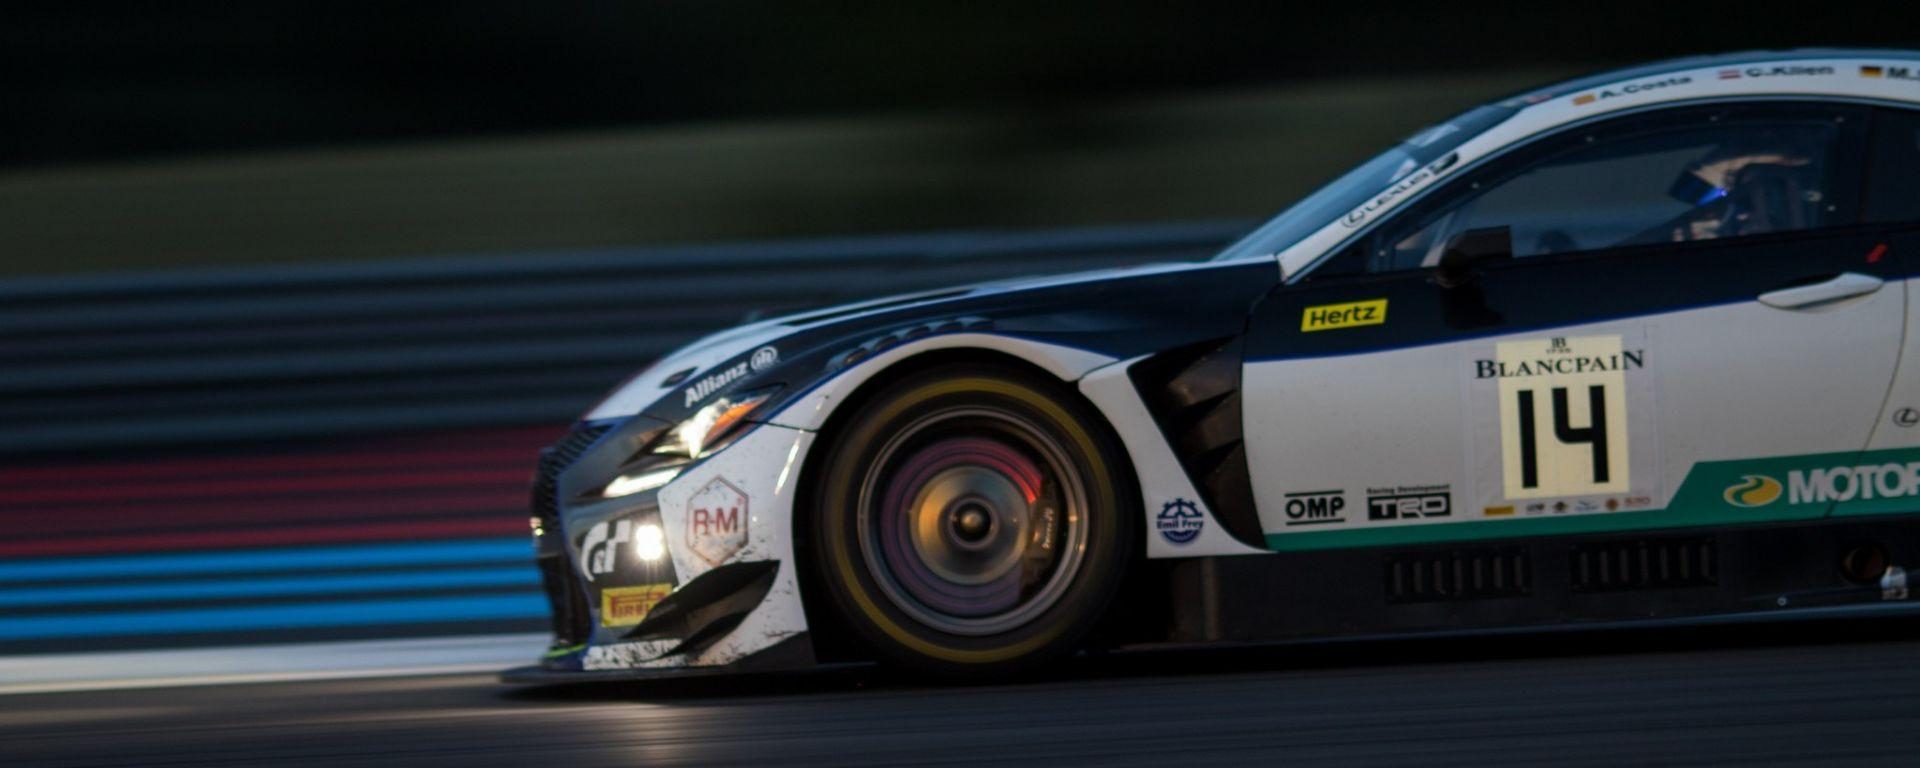 Blancpain GT: Lexus conquista il Paul Ricard davanti a Bentley e McLaren (gallery)